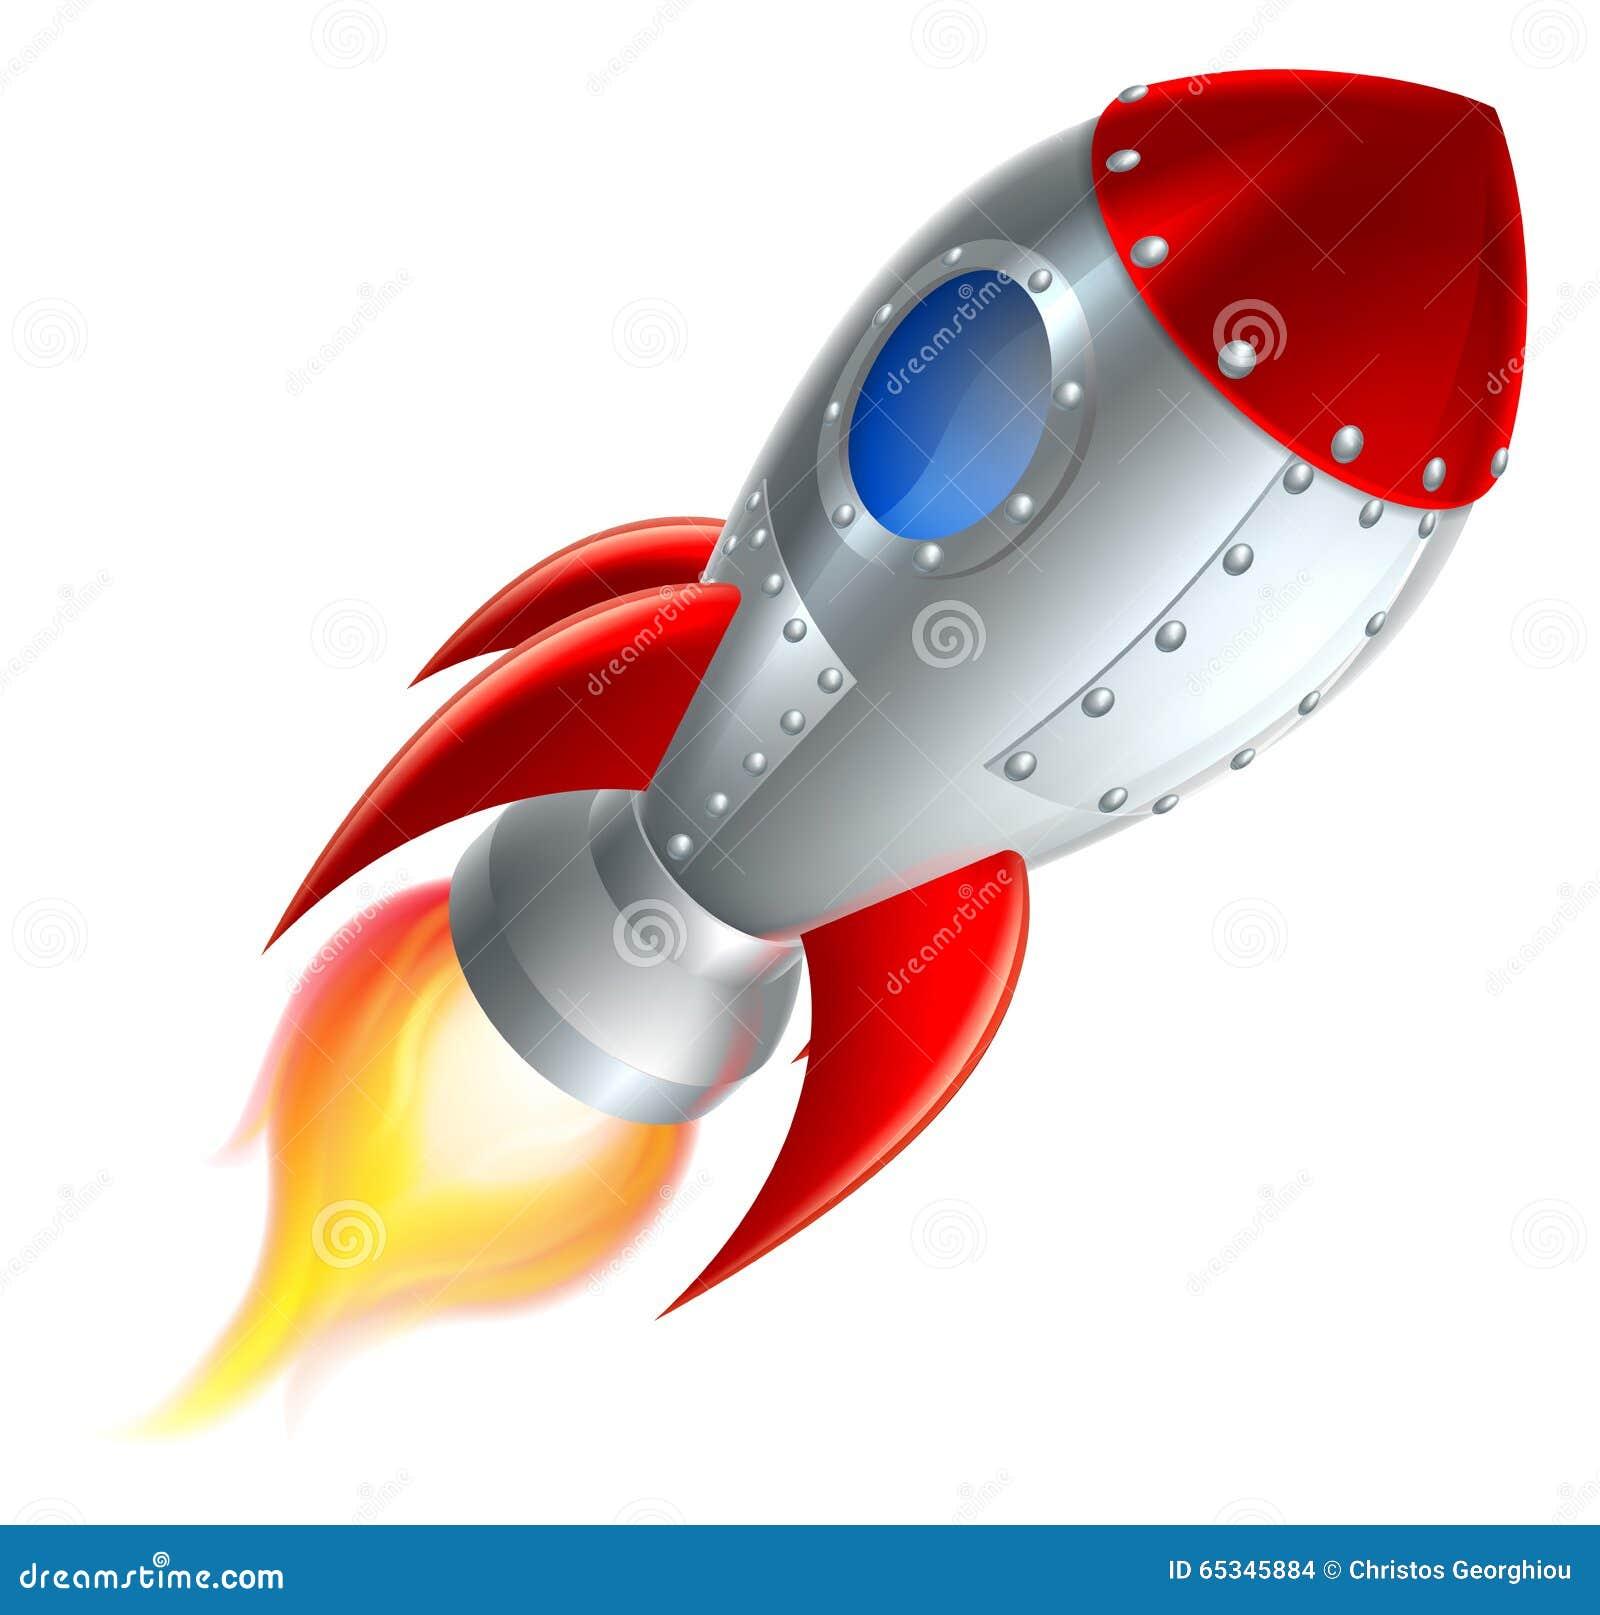 rocket space ship cartoon stock vector illustration of spaceship clipart free spaceship clipart png